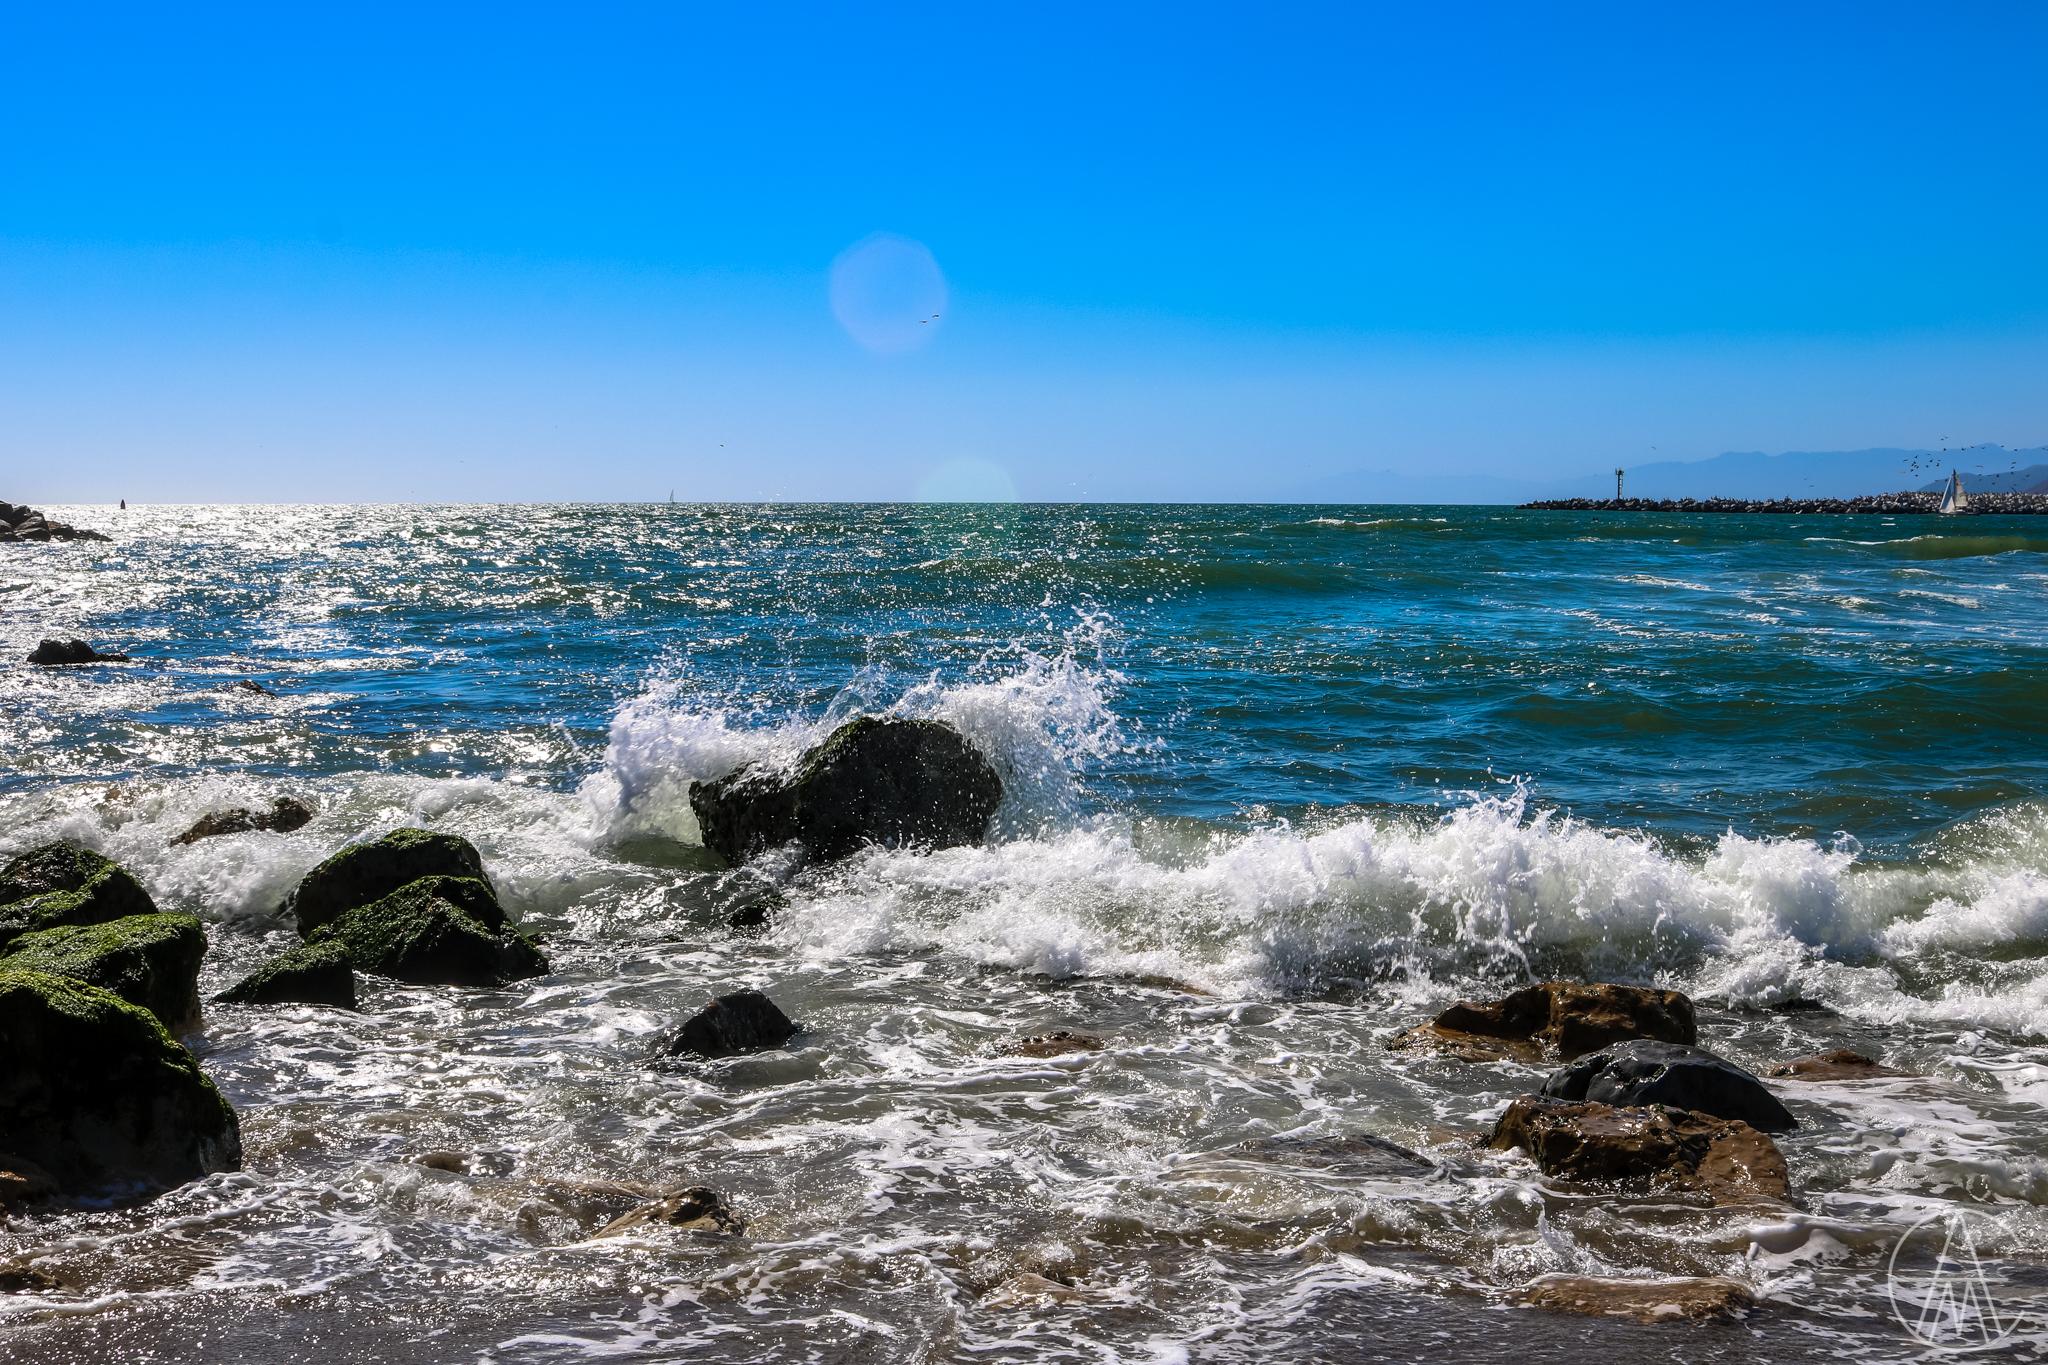 VenturaHarbor_BeachRockSurf_FACEBOOK.jpg